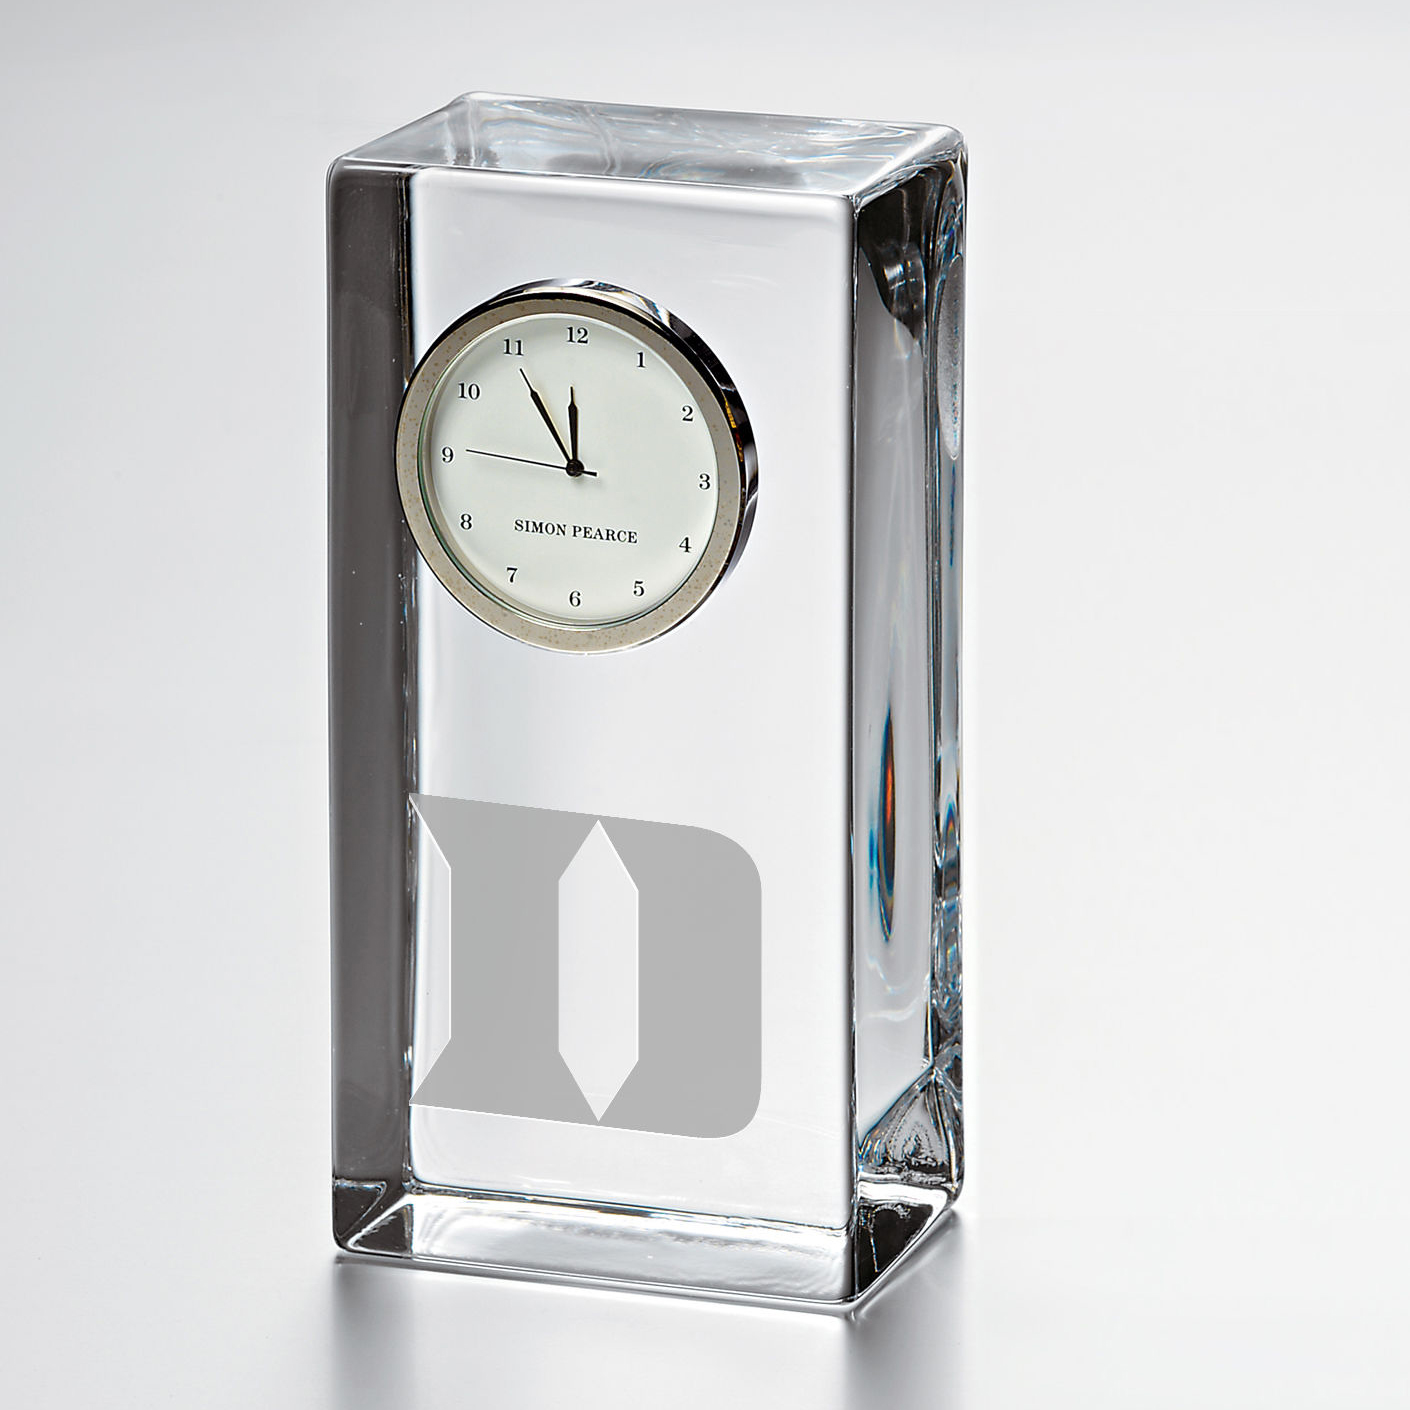 Duke Tall Glass Desk Clock by Simon Pearce